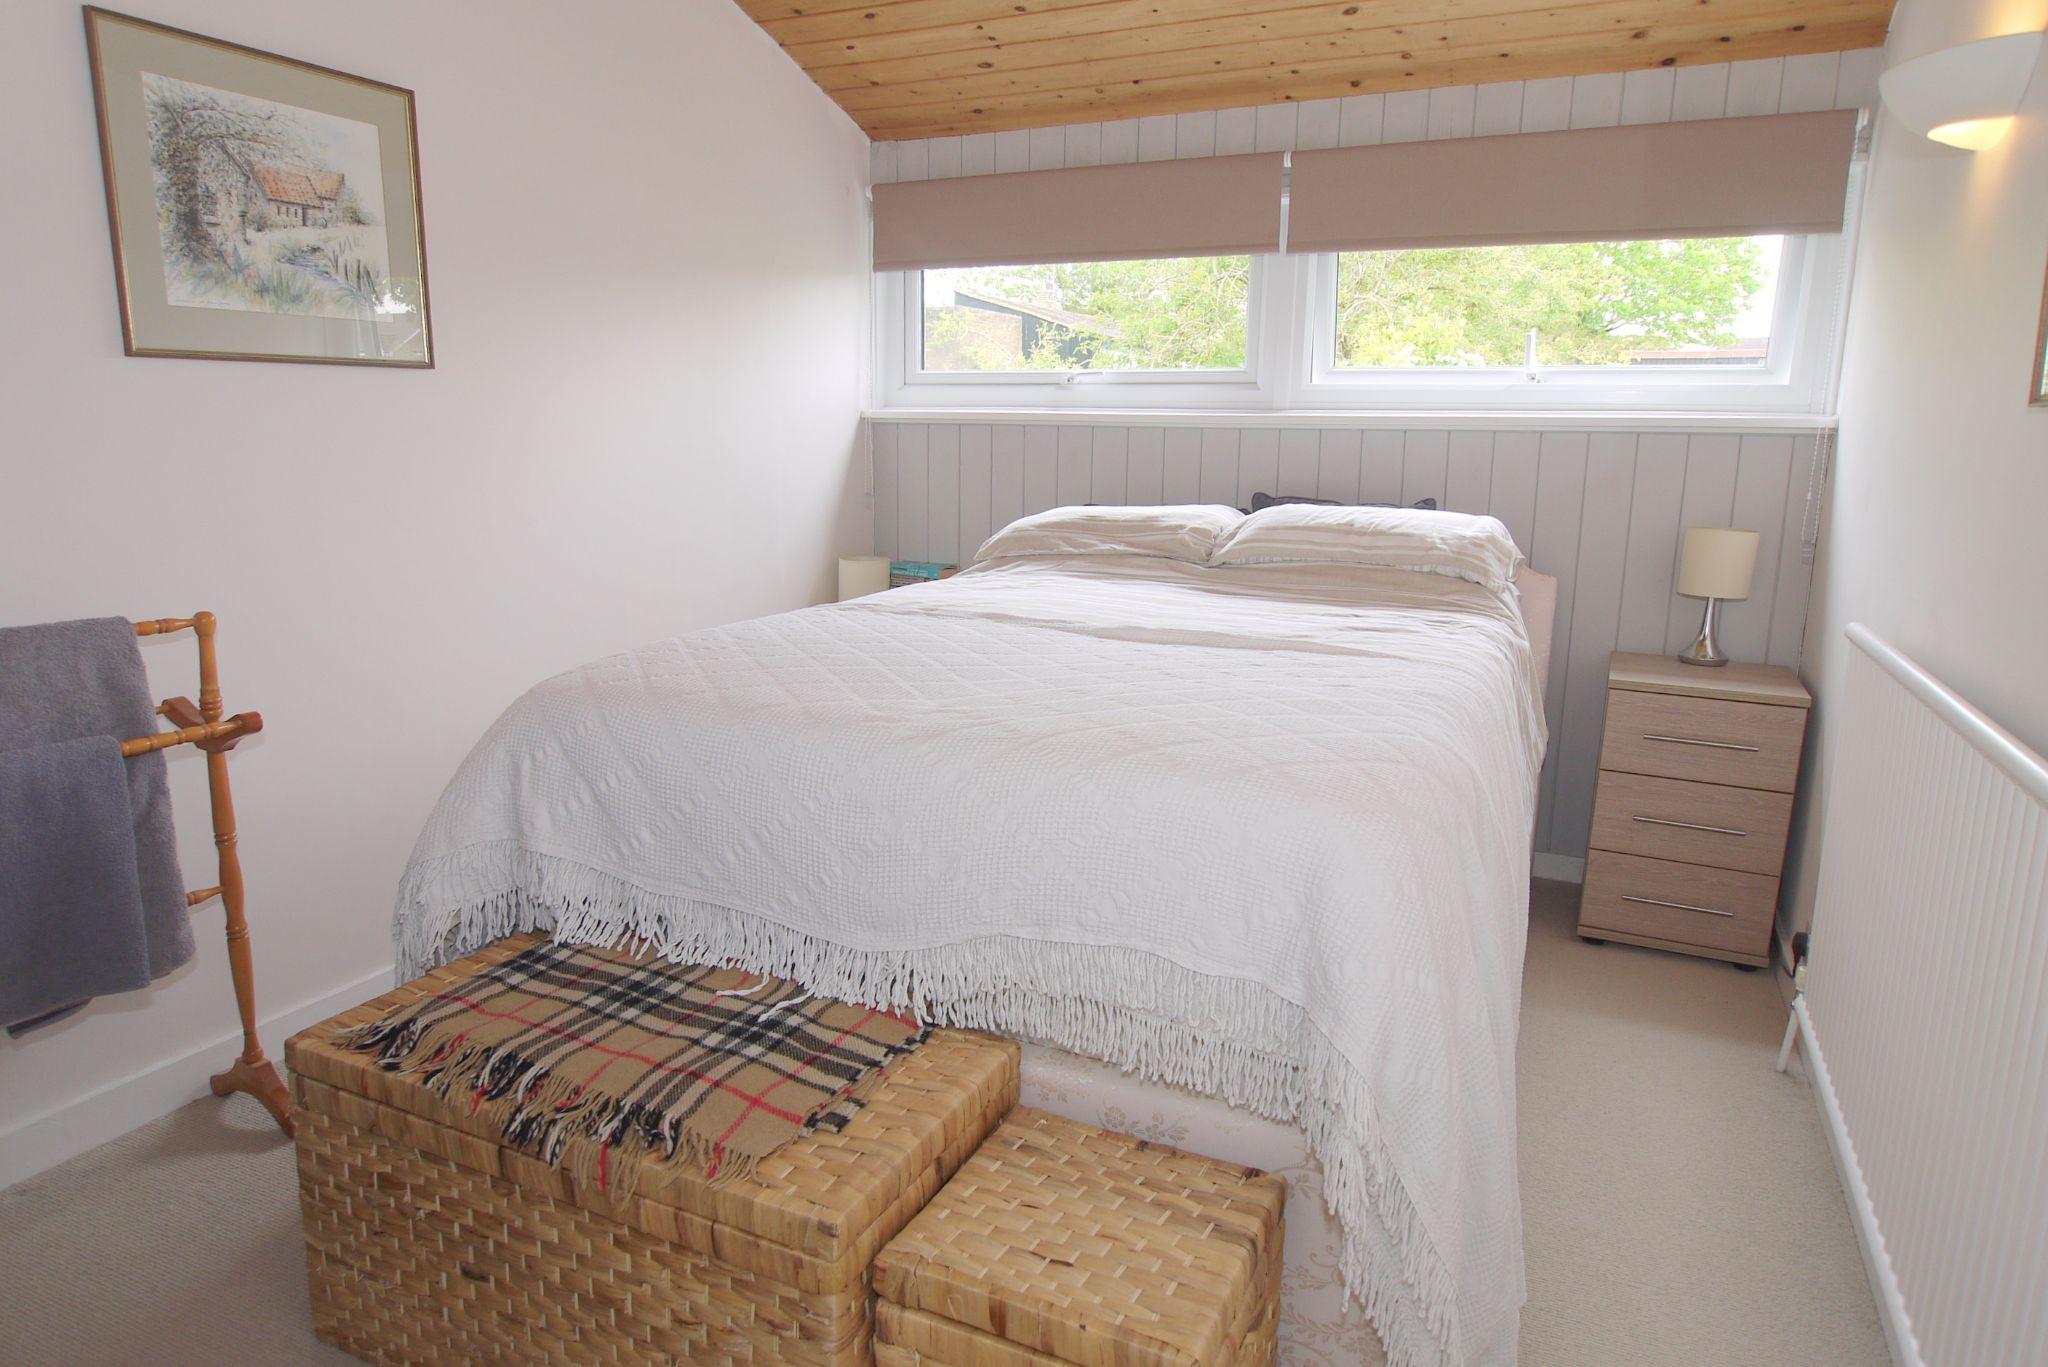 3 bedroom semi-detached house Sold in Sevenoaks - Photograph 6